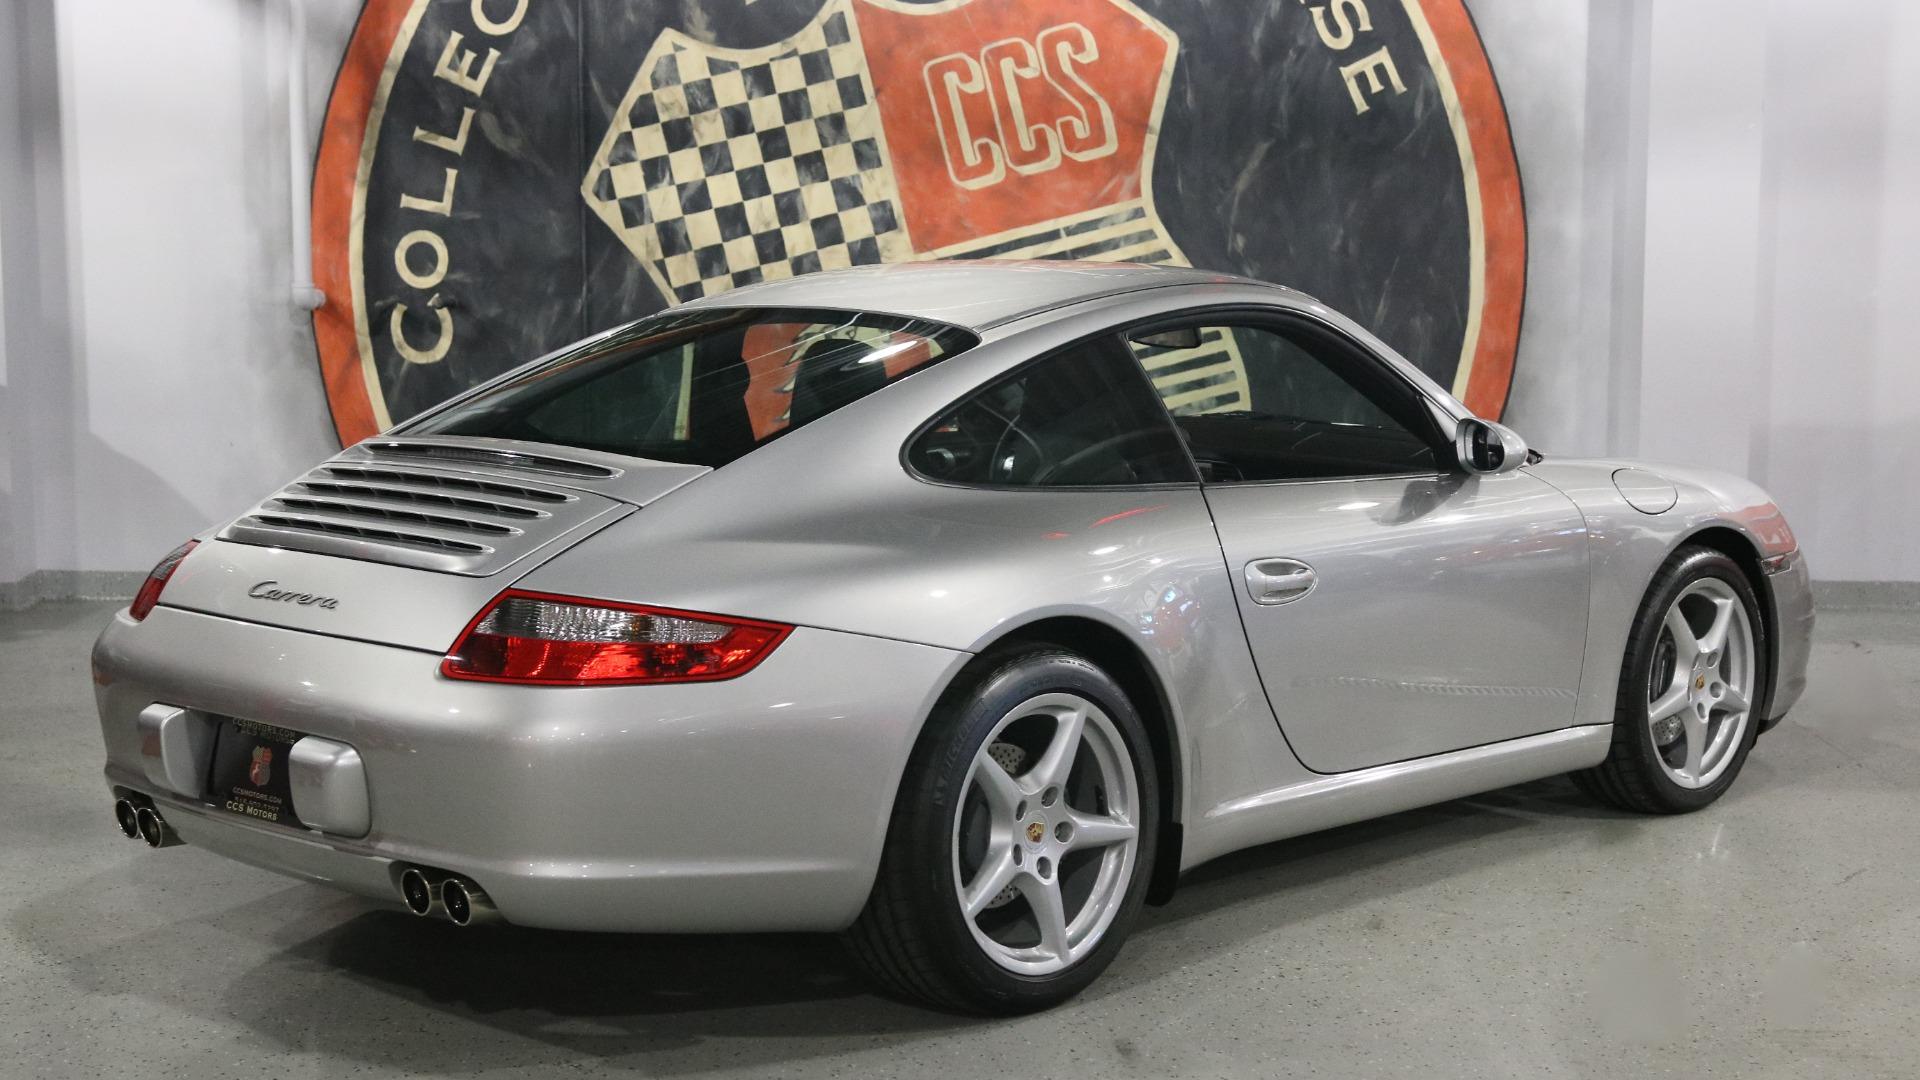 2006 porsche 911 carrera coupe stock 1218a for sale near oyster bay ny ny porsche dealer. Black Bedroom Furniture Sets. Home Design Ideas